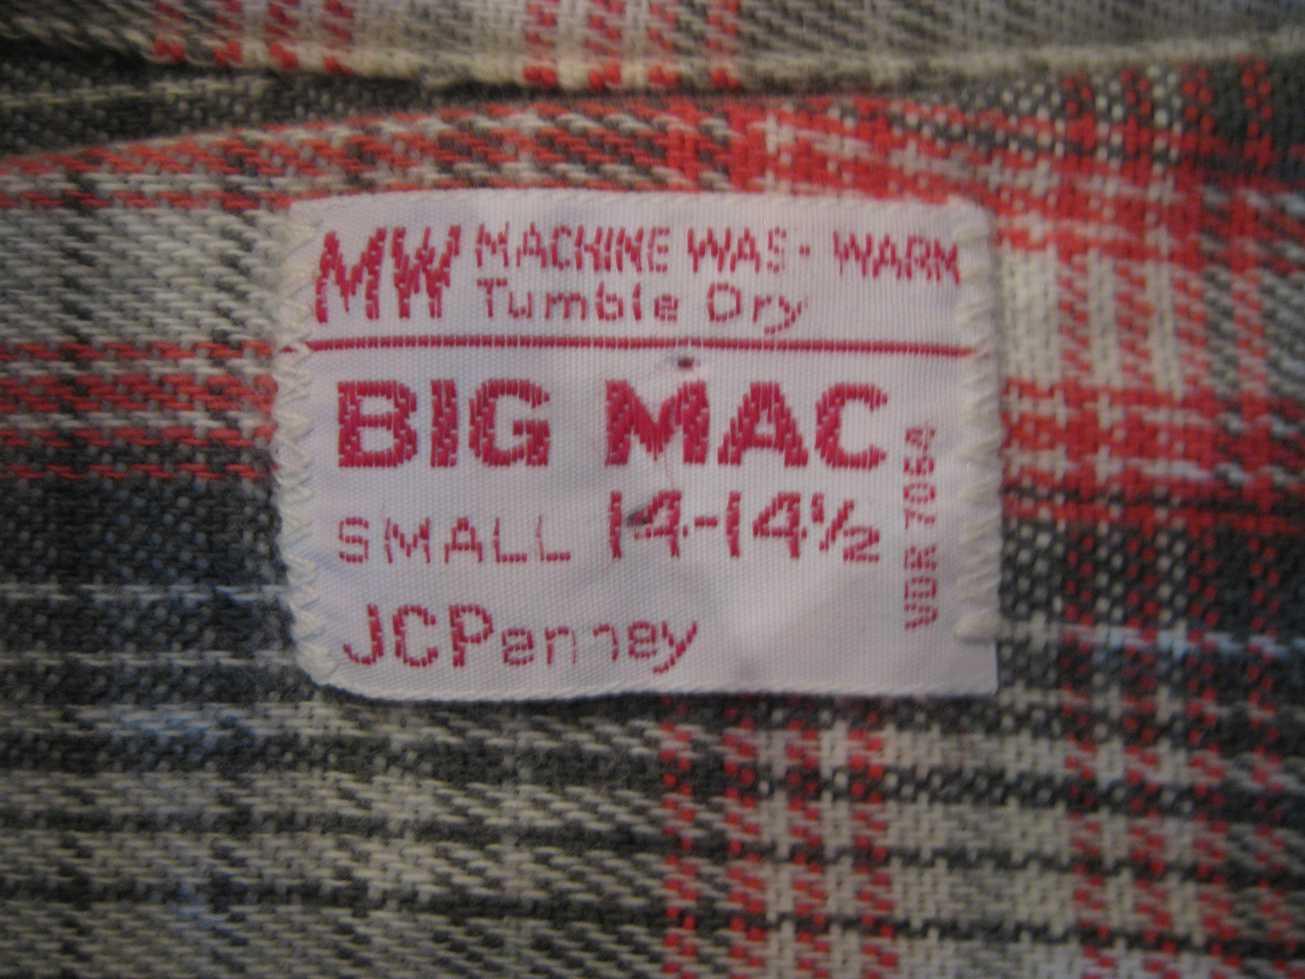 BIG MAC Nel Shirts !!!_e0187362_1133615.jpg